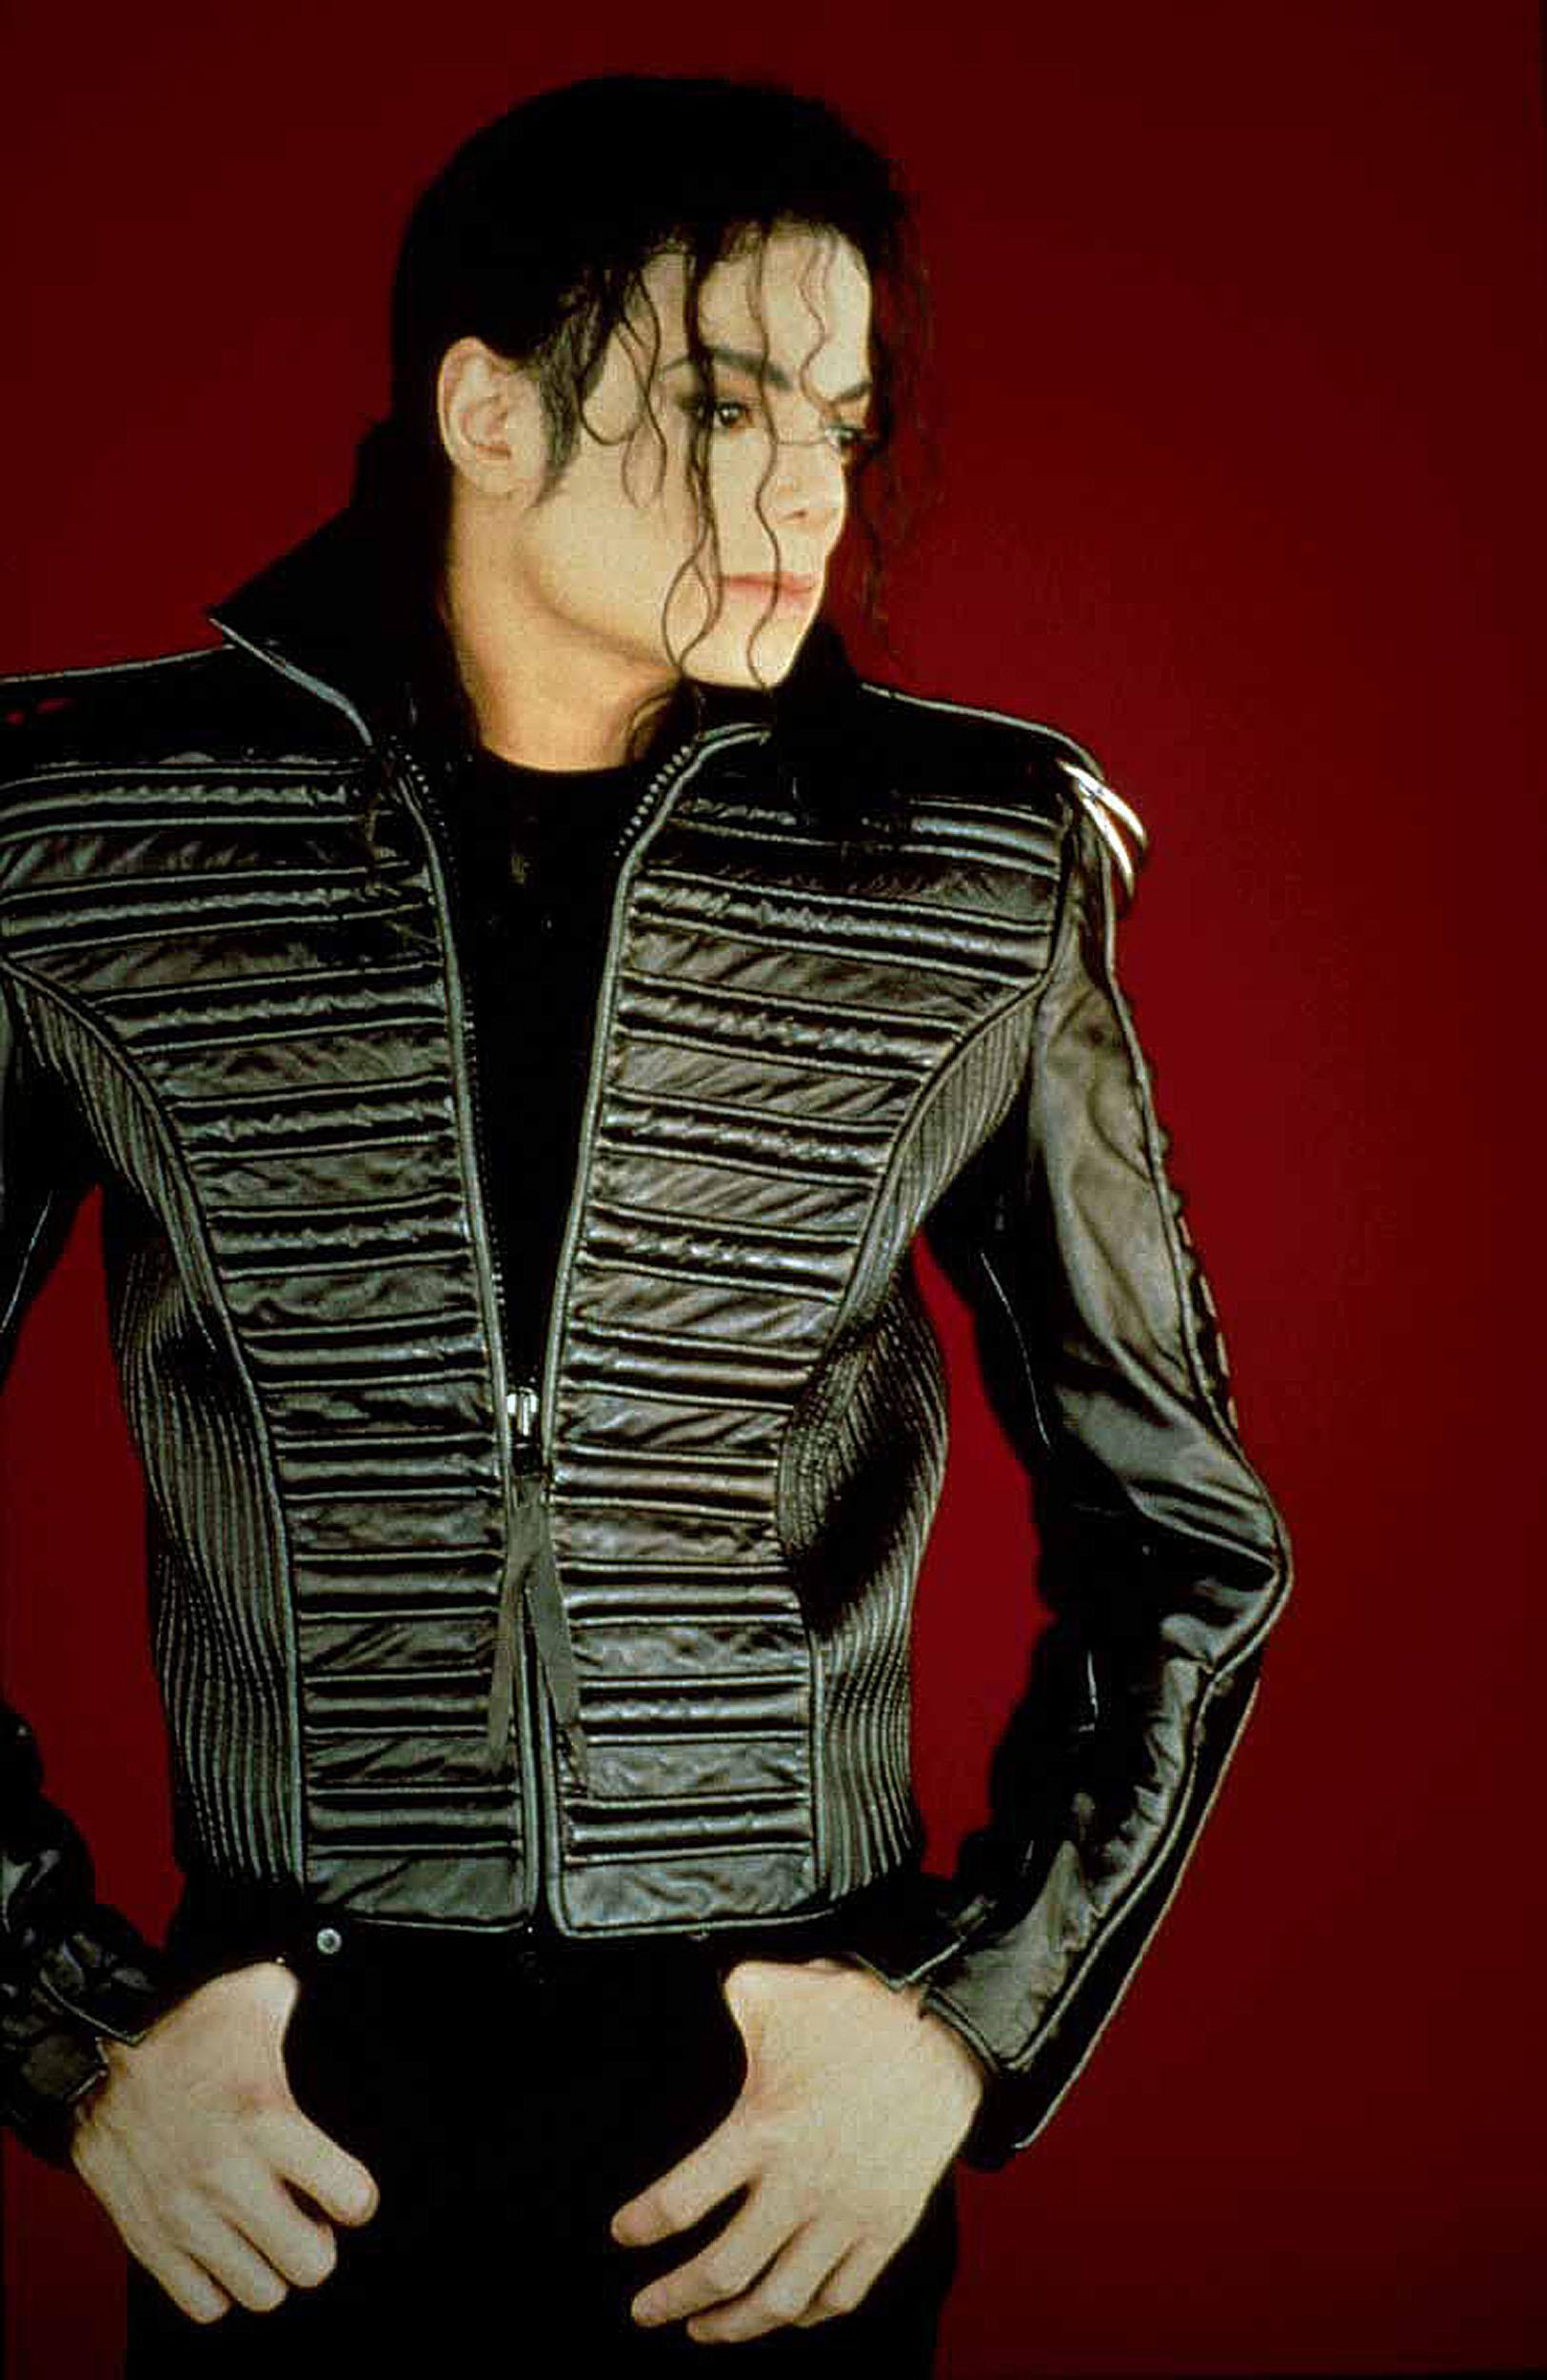 Pochette Black or White Michael Jackson